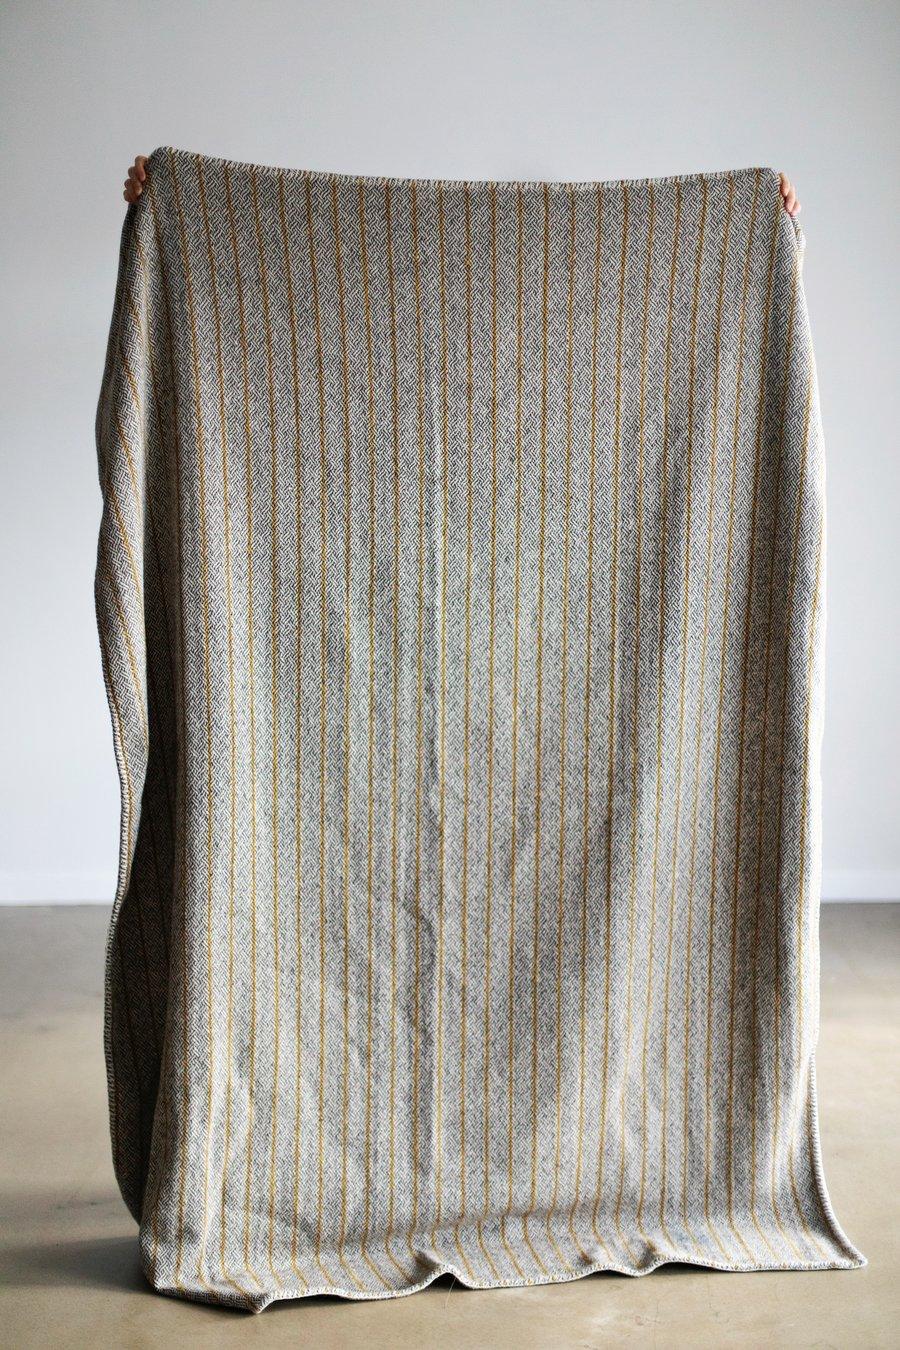 Image of Throw: Bristol Cloth 2nd Edition